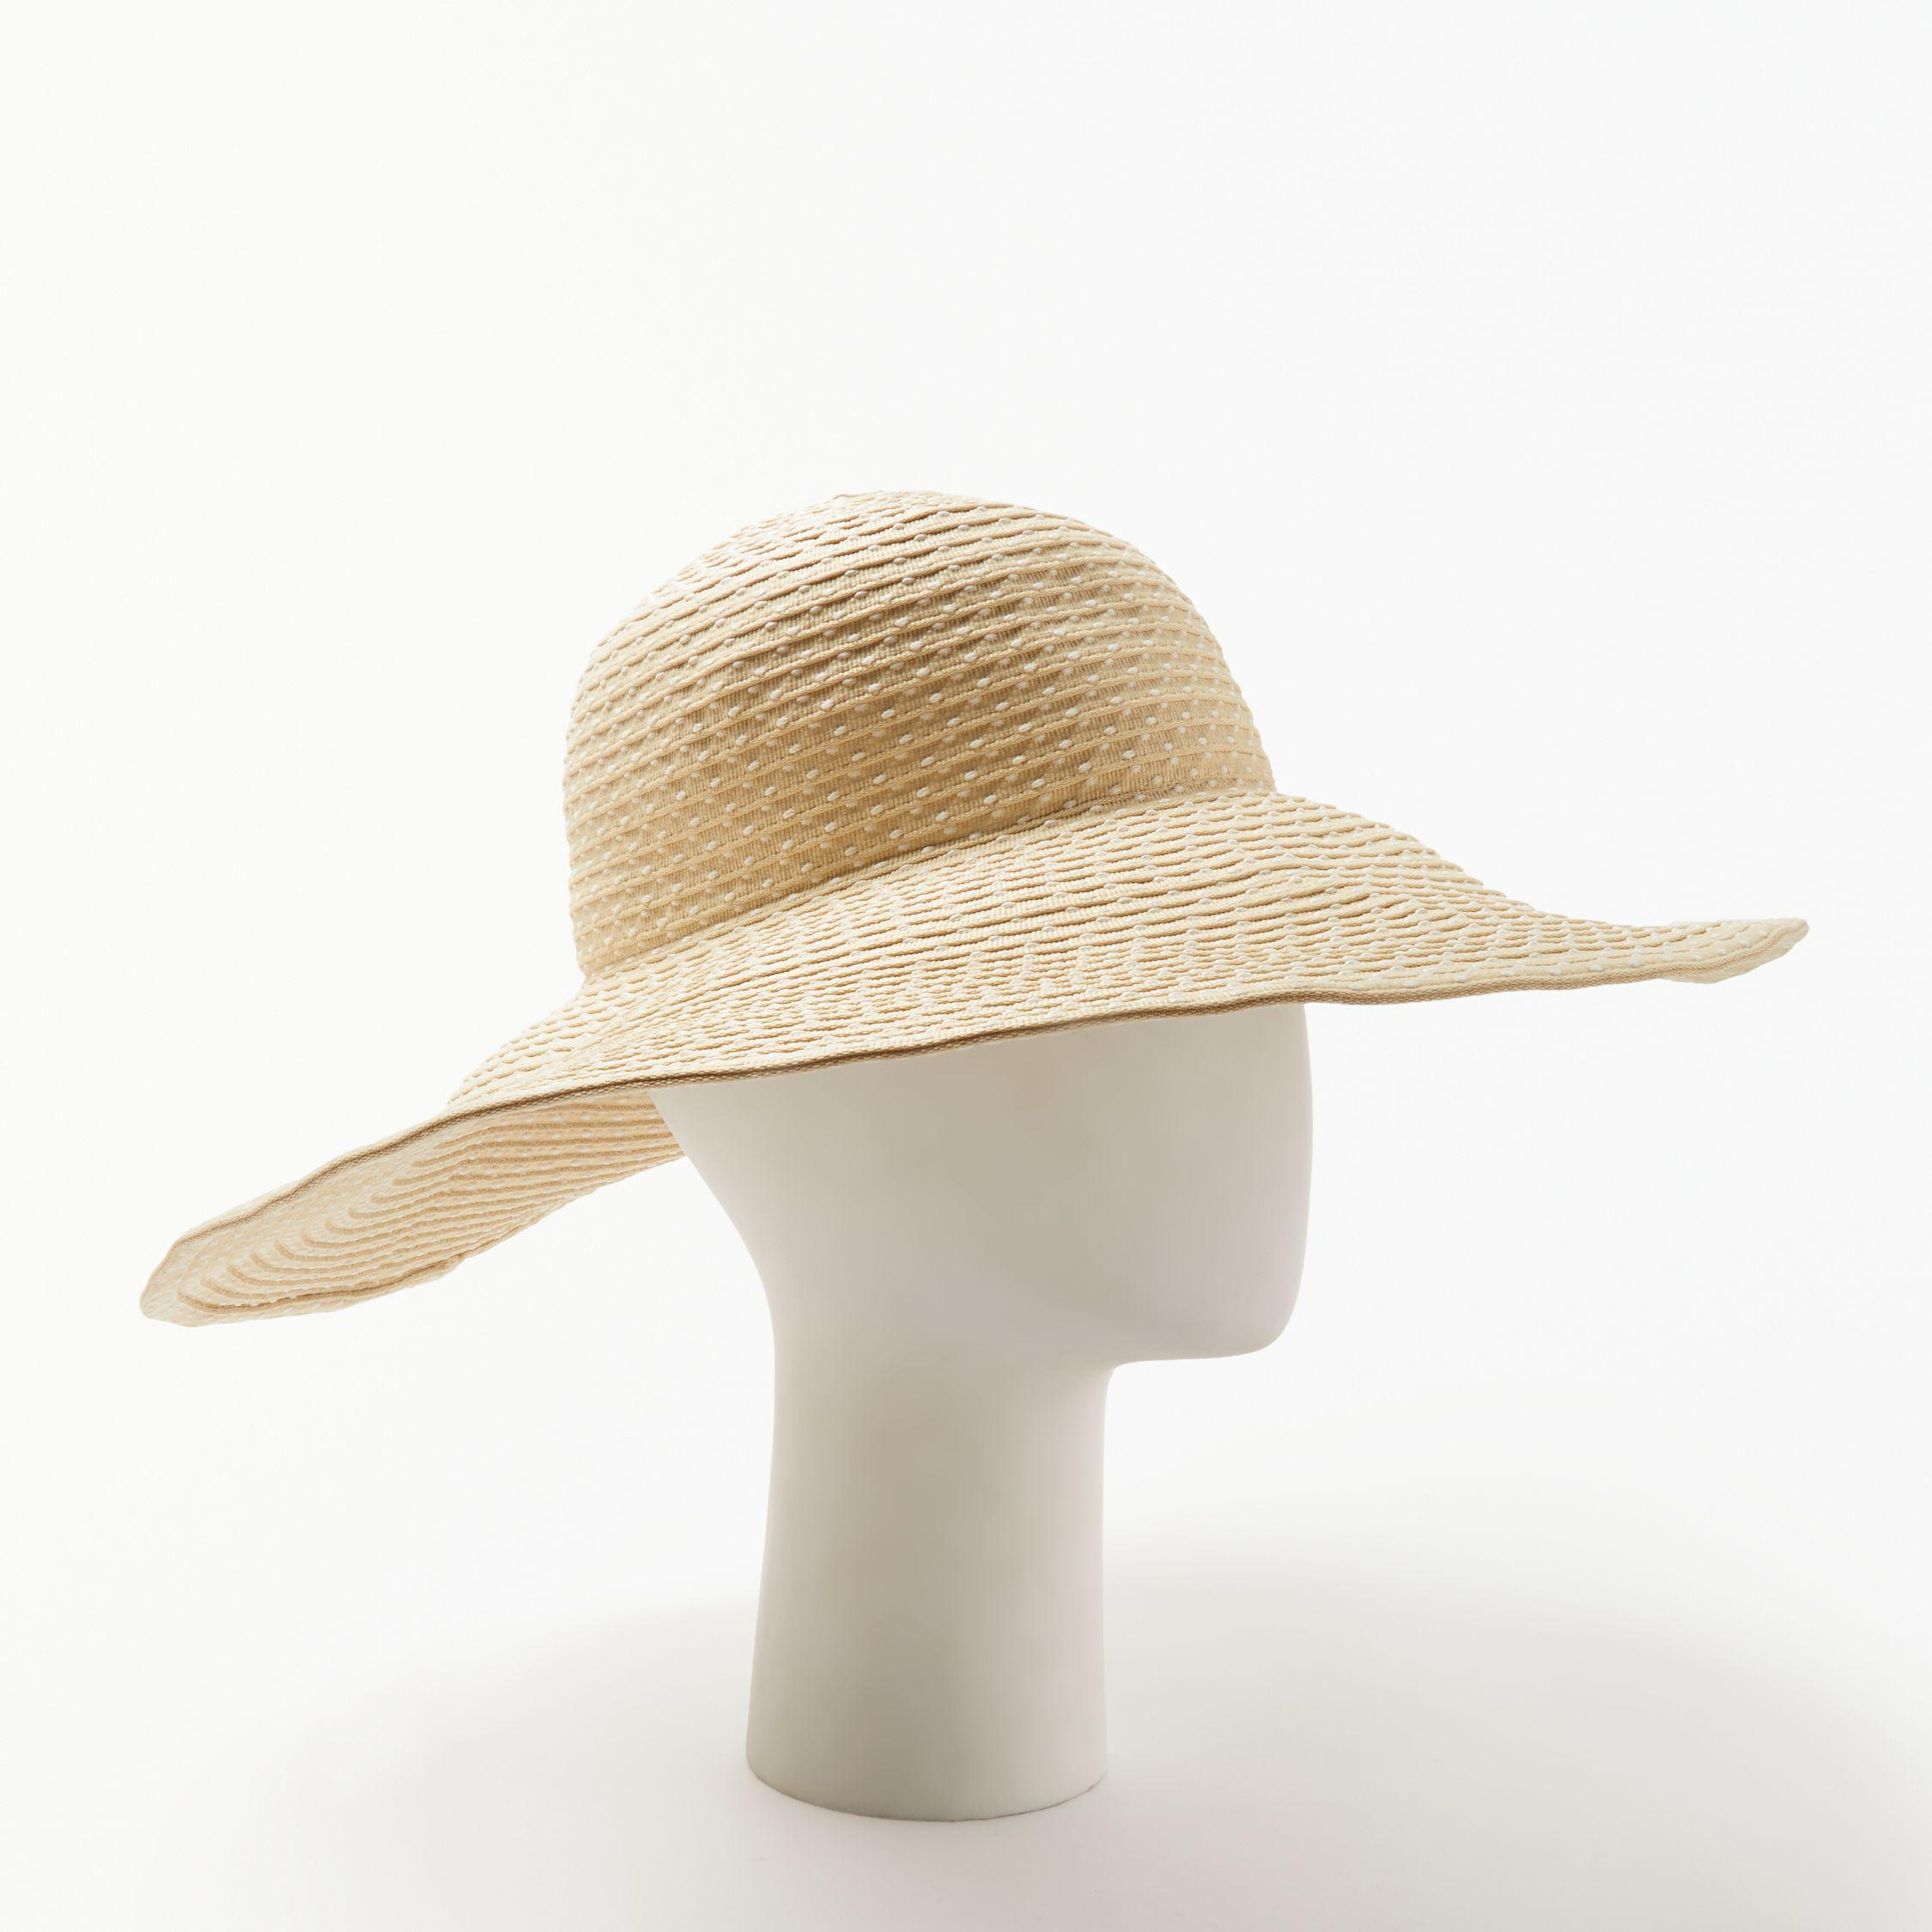 9addffc790d John Lewis Packable Spot Floppy Hat in Natural - Lyst